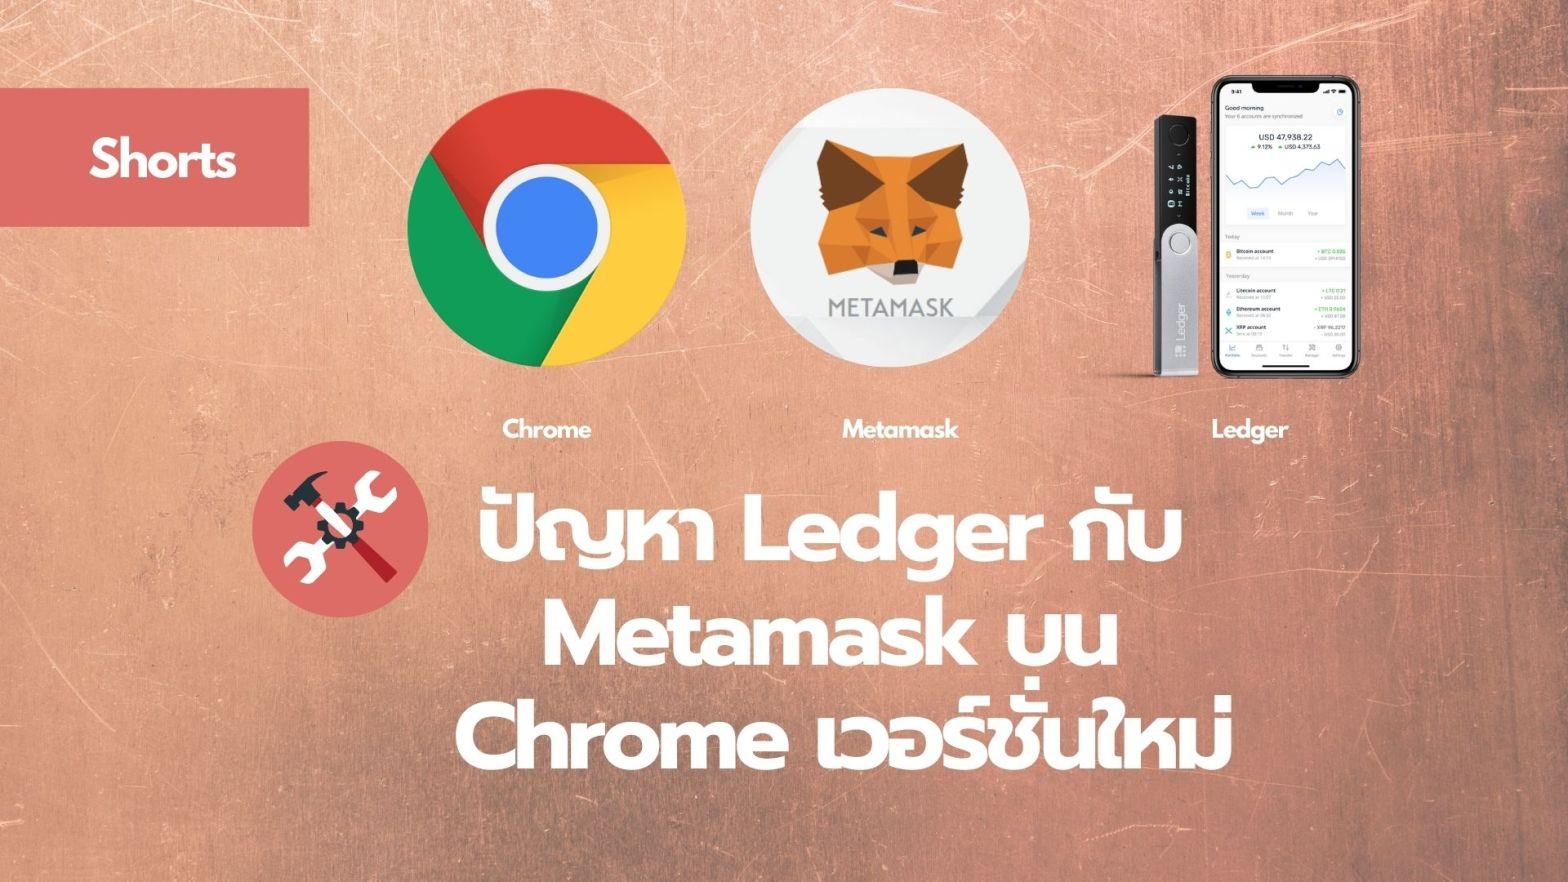 Chrome เชื่อมต่อ Ledger ผ่าน Metamask ไม่ได้